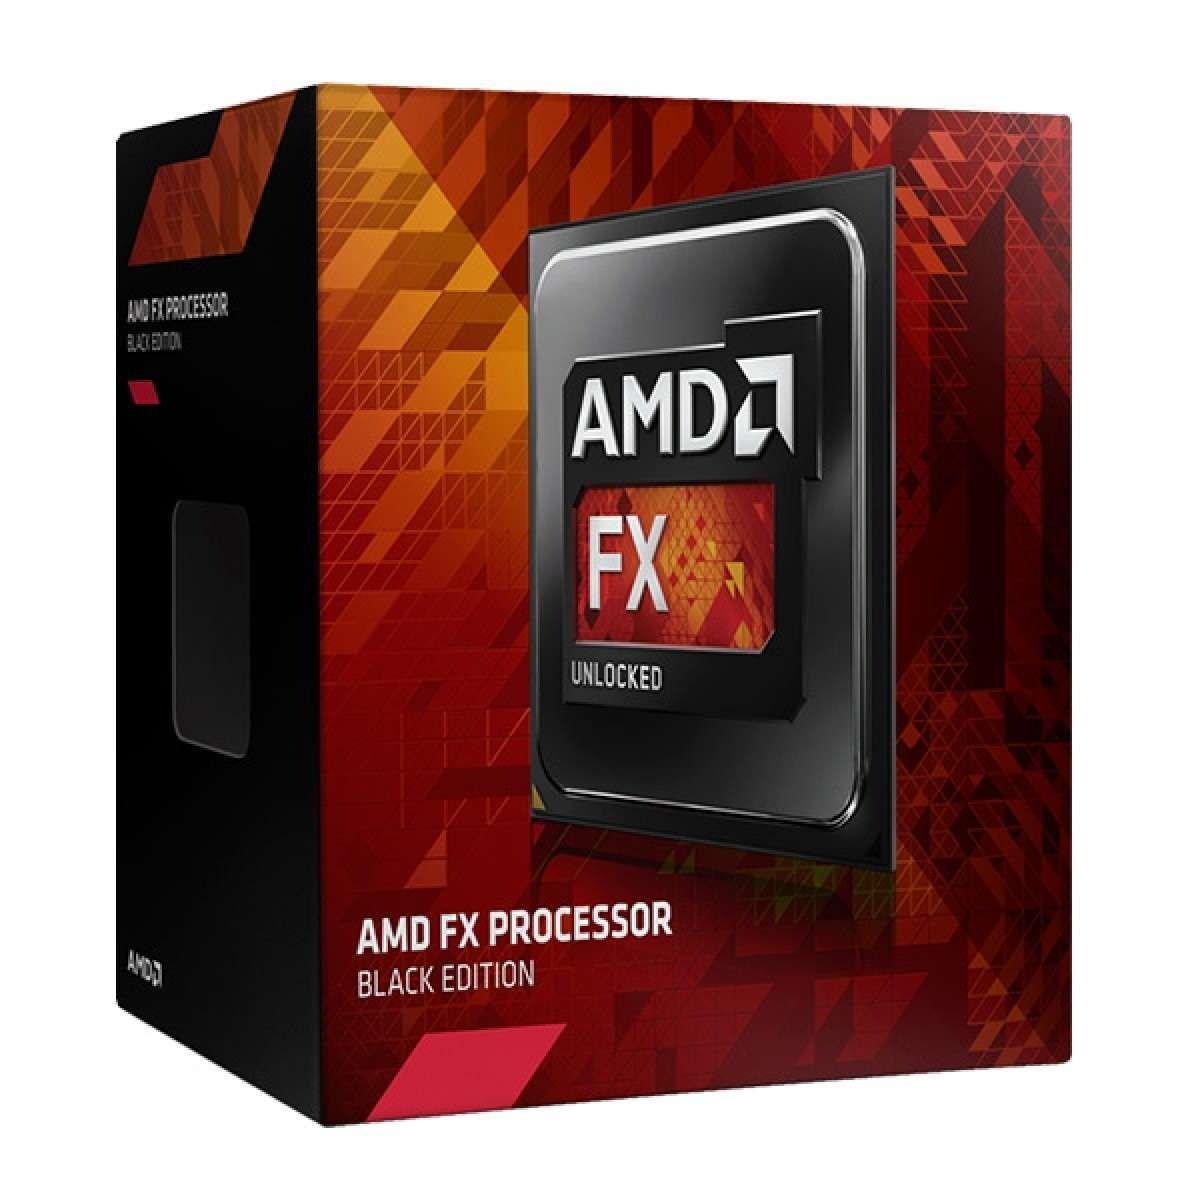 Processador AMD FX 8320E Octa Core, Black Edition, 3.2GHz 16MB AM3+ FD832EWMHKBOX